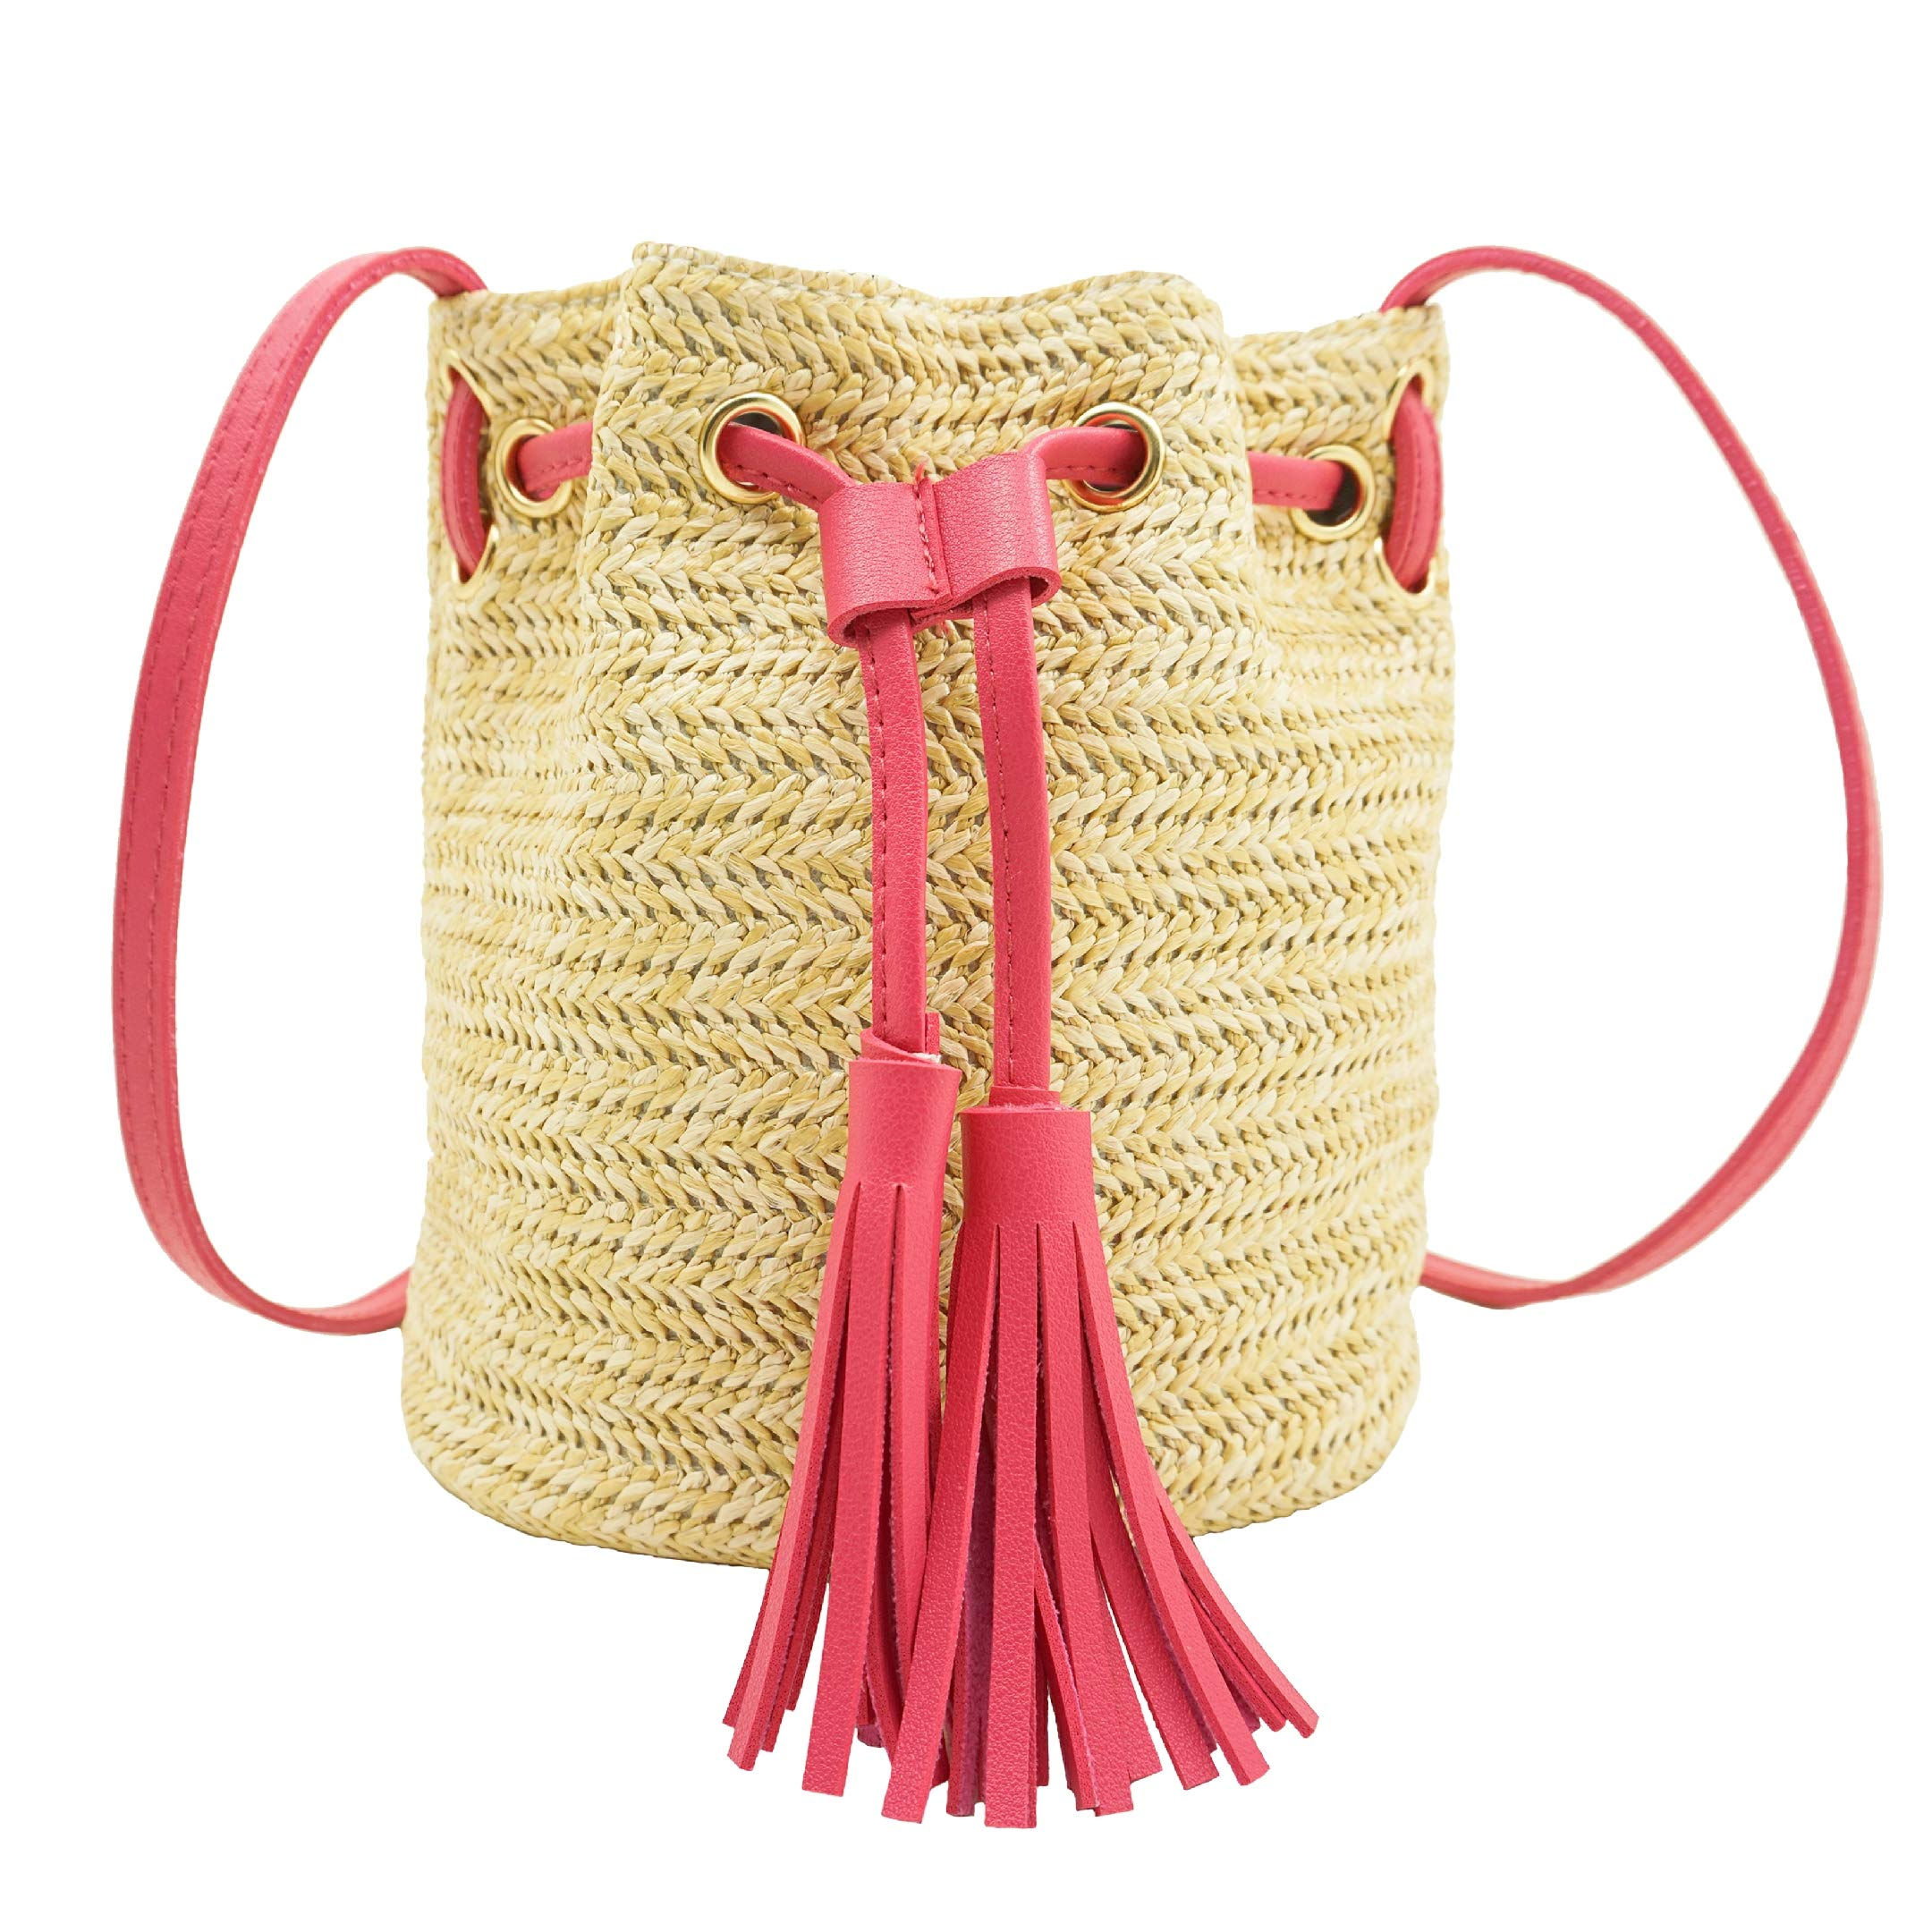 Straw Bag, BCTEX Woven Beach Crossbody Bag Leather Tassel Shoulder Purse Drawstring Summer Bag